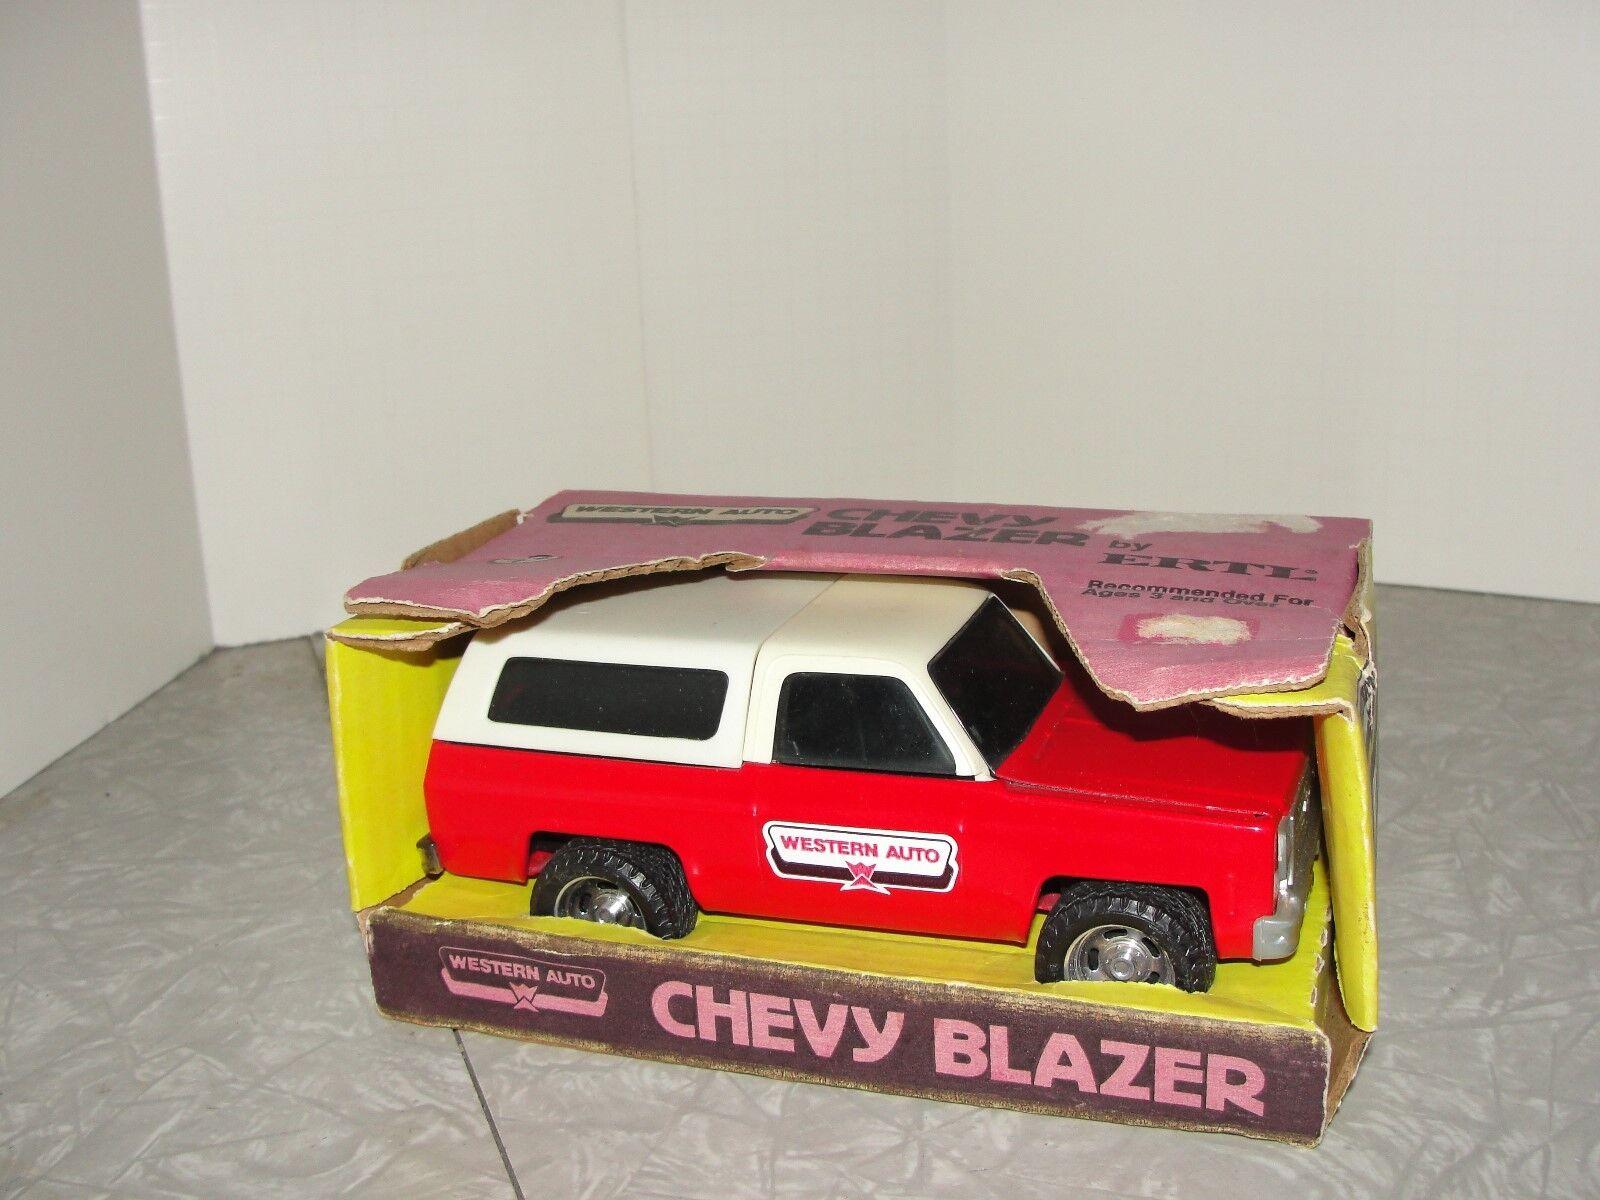 VIntage Ertl Western Auto Chevrolet Blazer Truck in the scatola